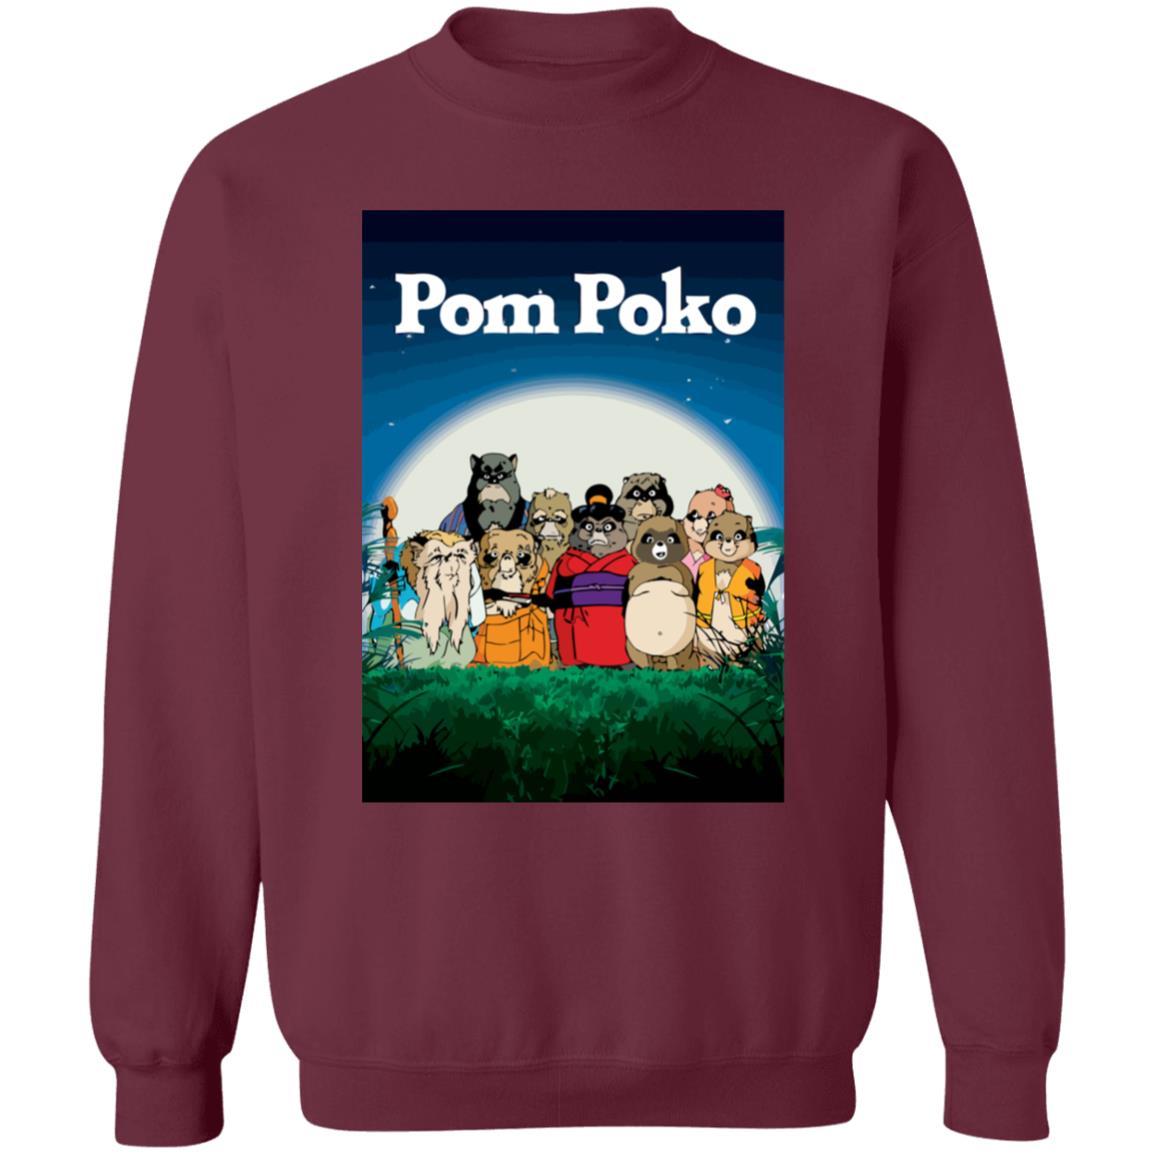 Pom Poko Poster Sweatshirt Unisex